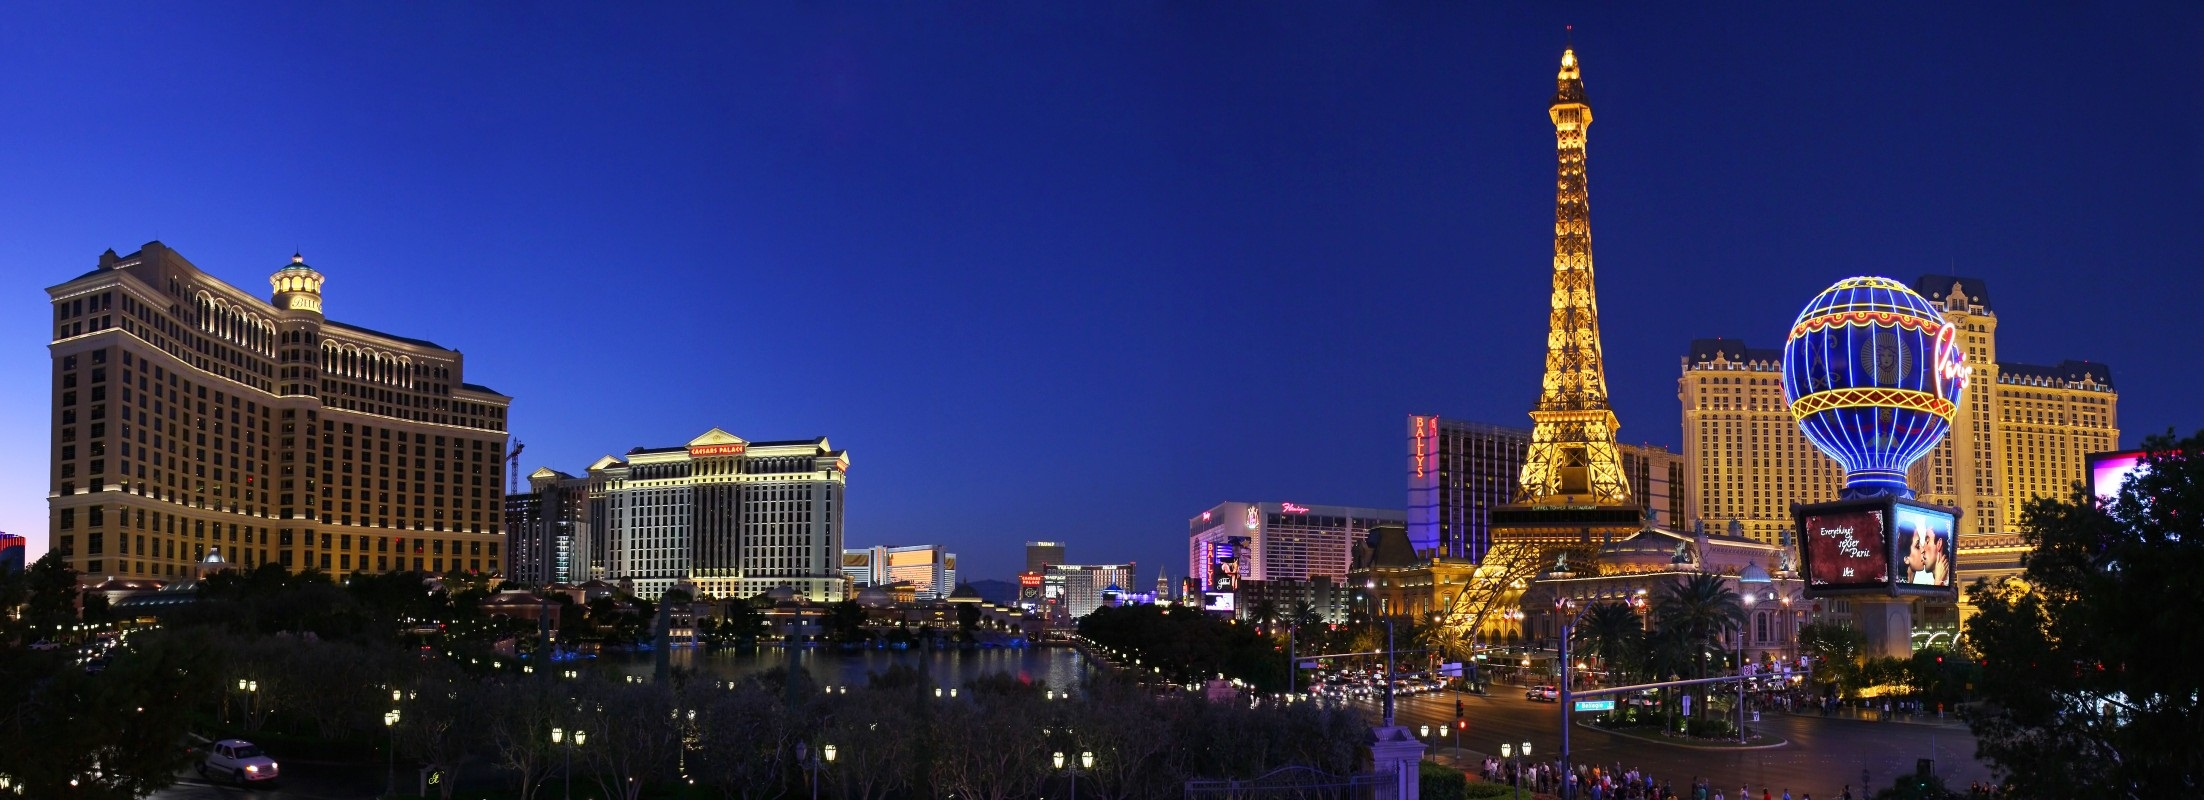 Las-Vegas-Strip-USA-Tour-Package